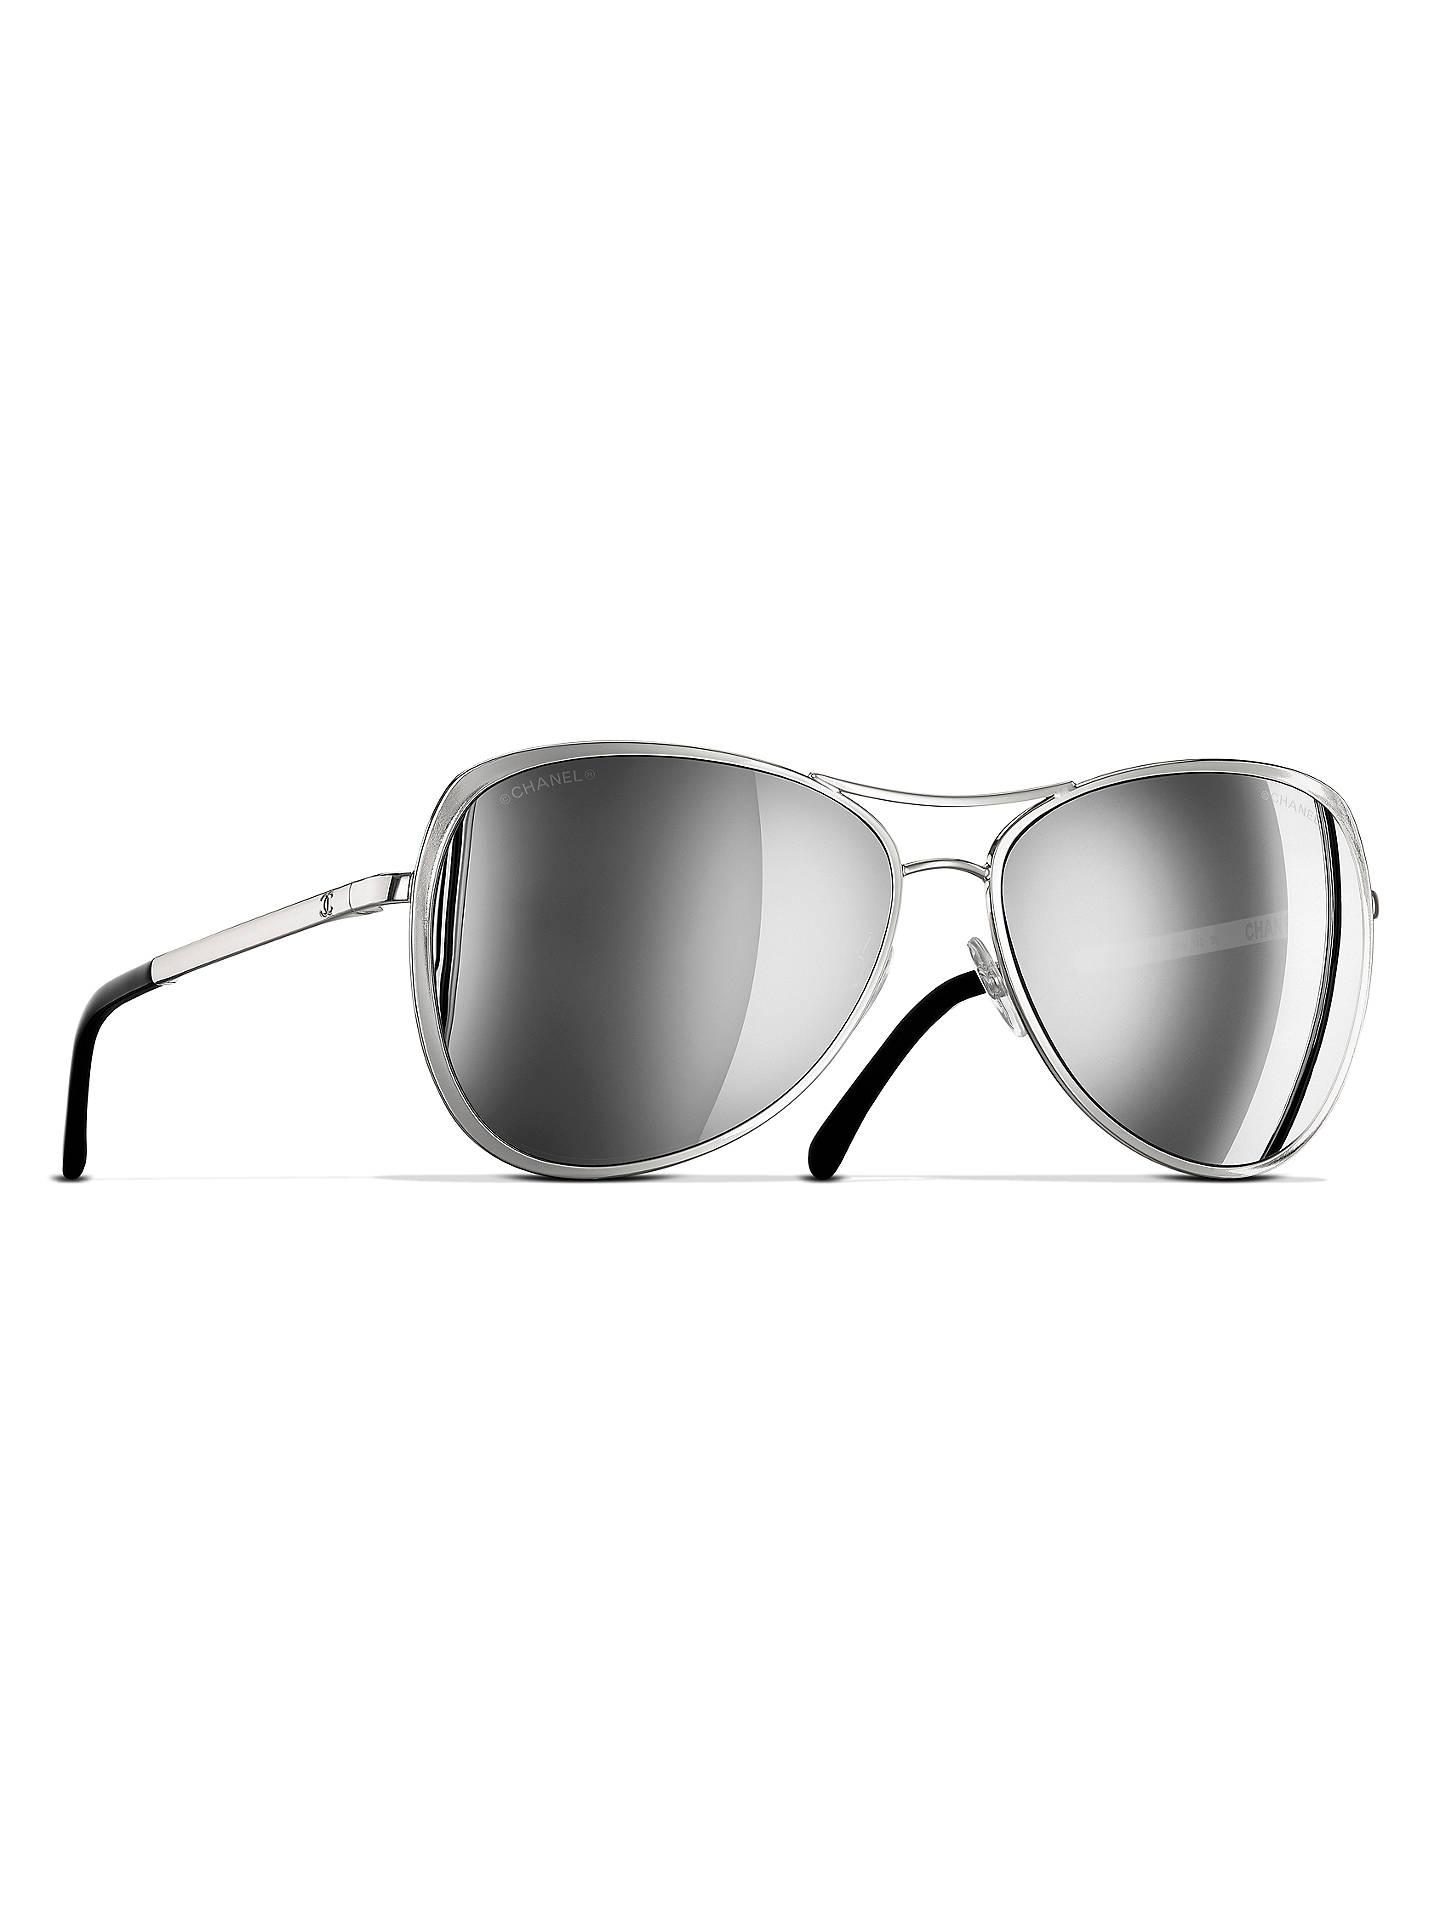 969f6b86b5 BuyCHANEL Pilot Sunglasses CH4223 Silver Online at johnlewis.com ...